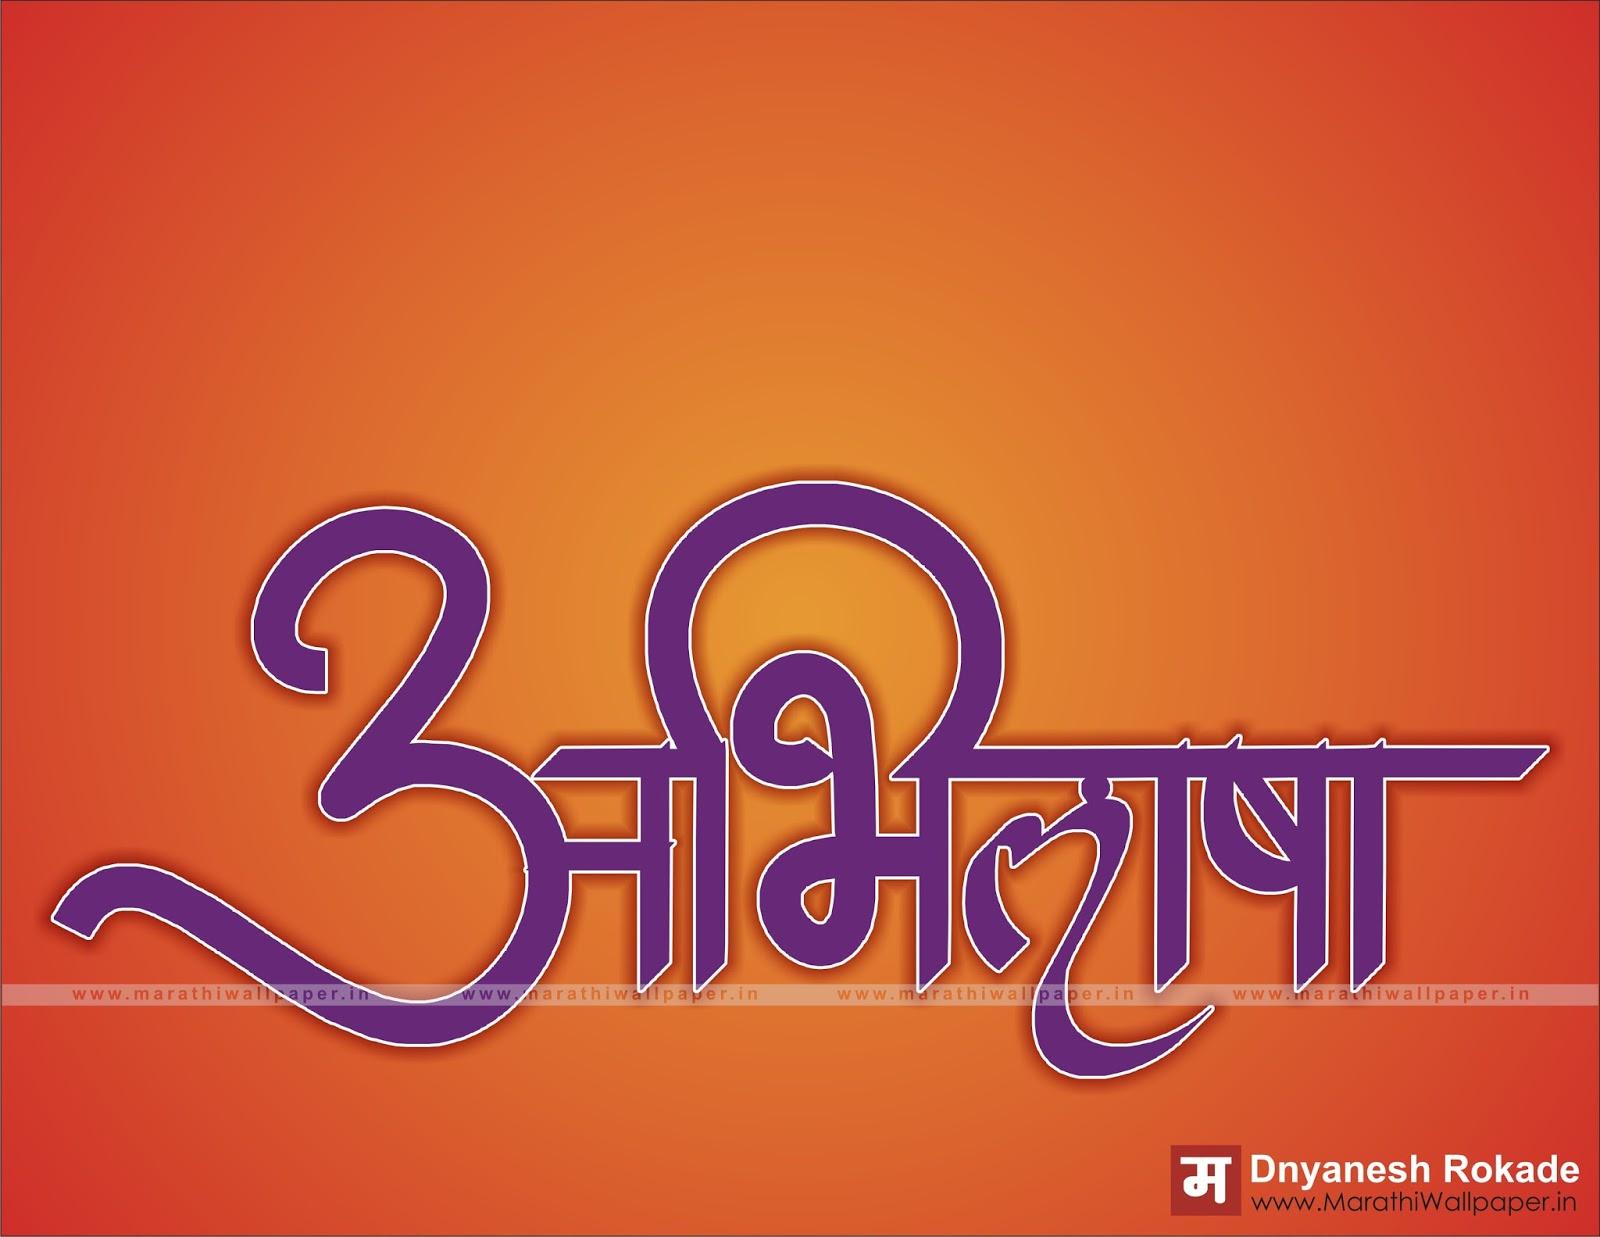 Abhilasha Name Wallpaper Marathi Calligraphy Dnyanesh Rokade